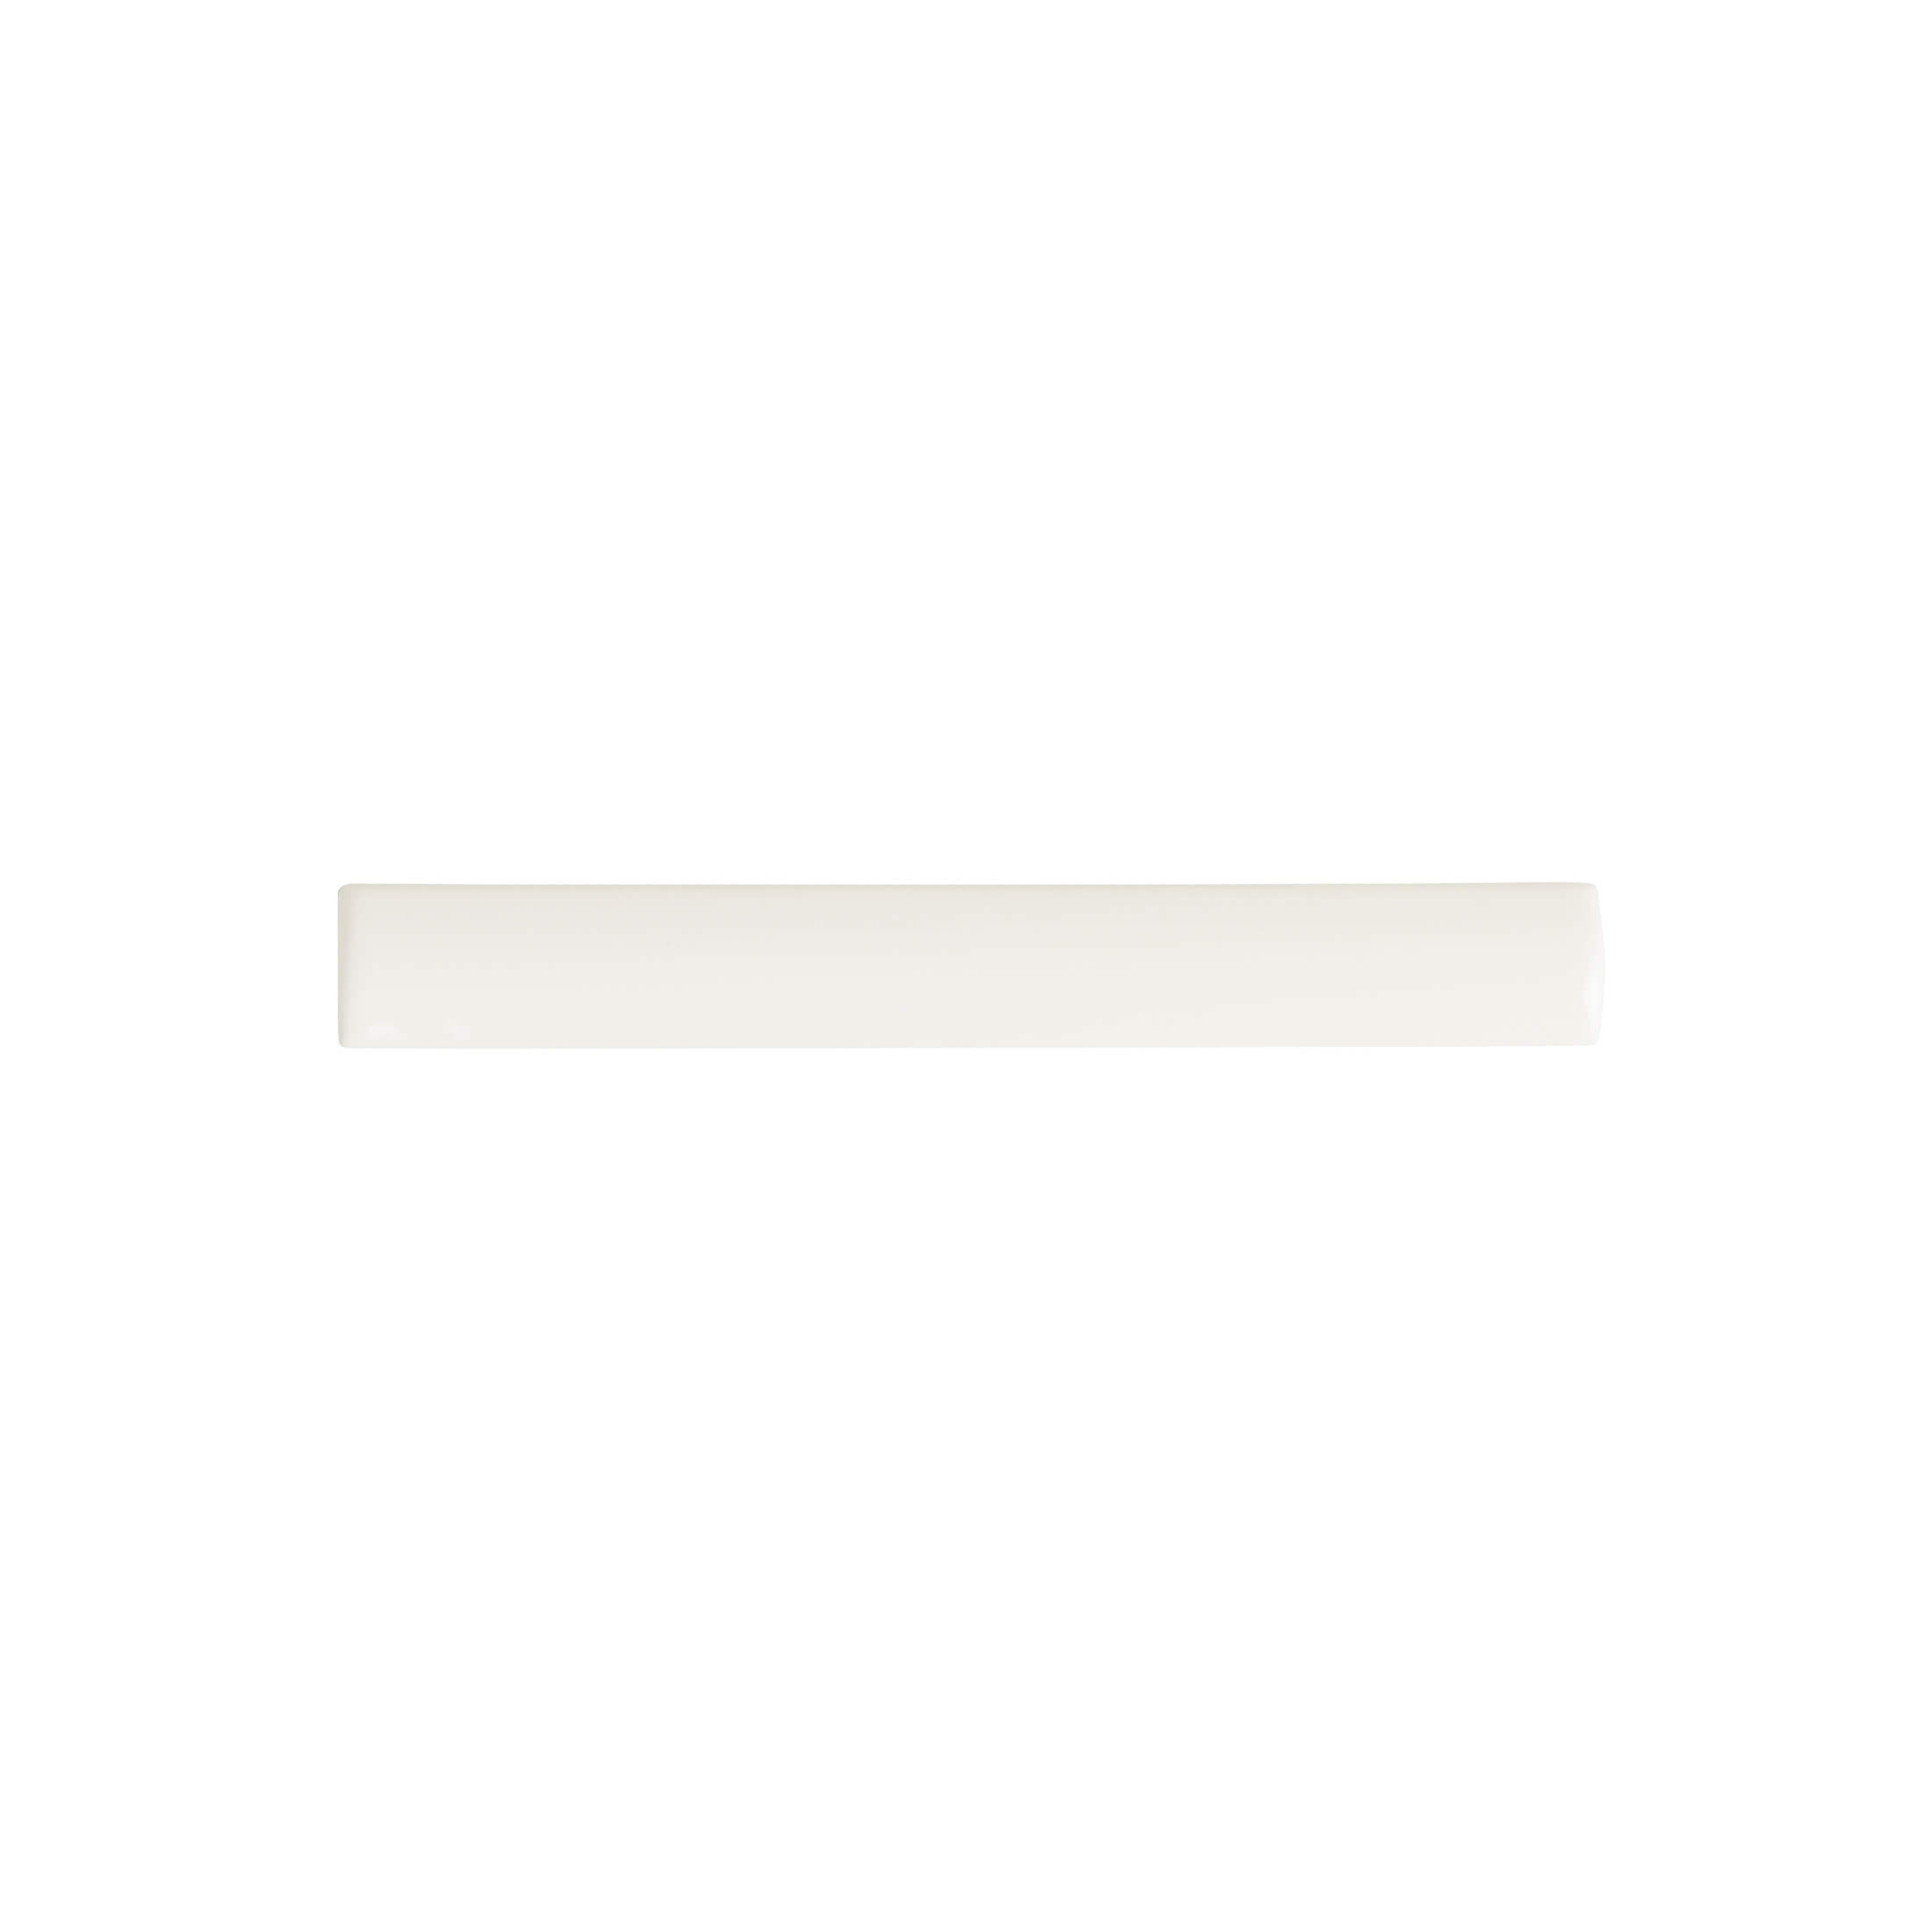 ADNE5180 - CUBRECANTO PB - 2.5 cm X 20 cm